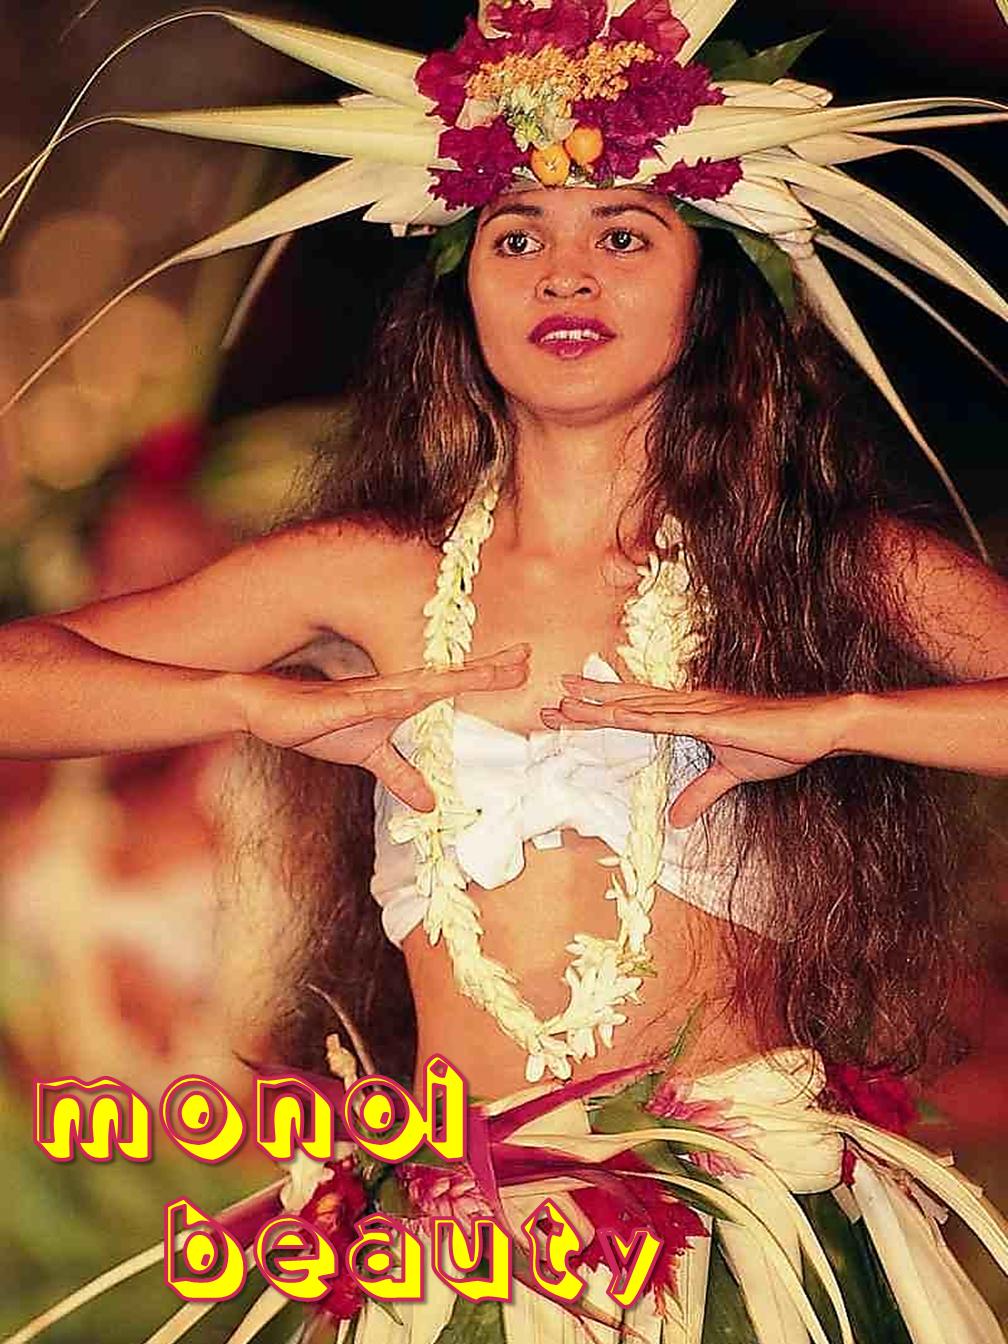 MONOI Beauty